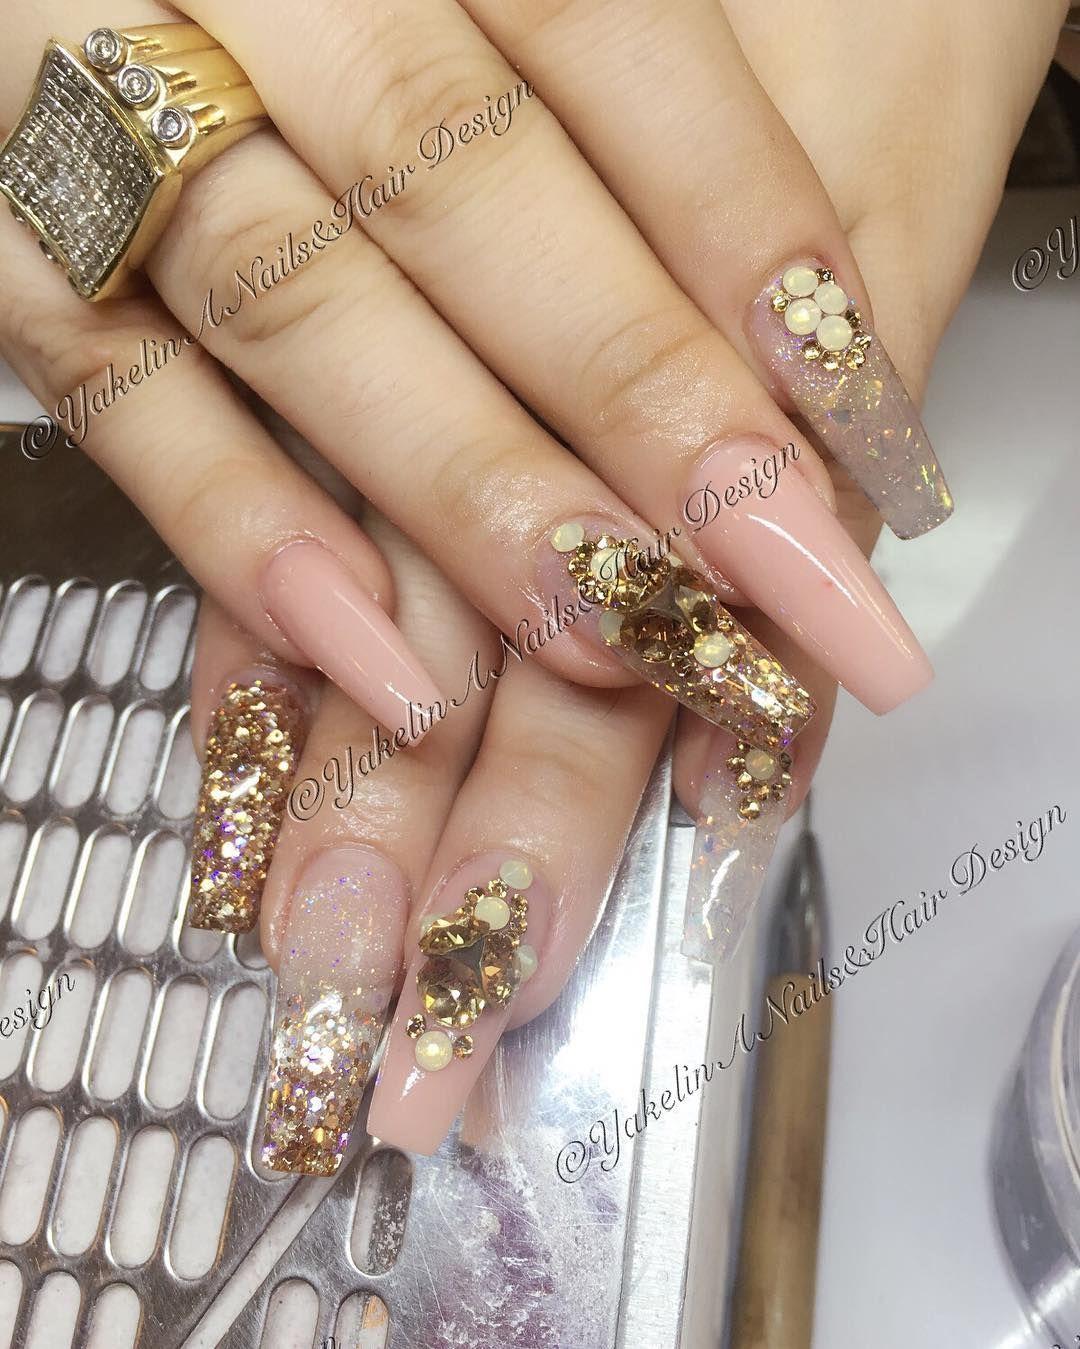 Pin de Mavis Wallace-Terry en Oh yeah! | Pinterest | Diseños de uñas ...